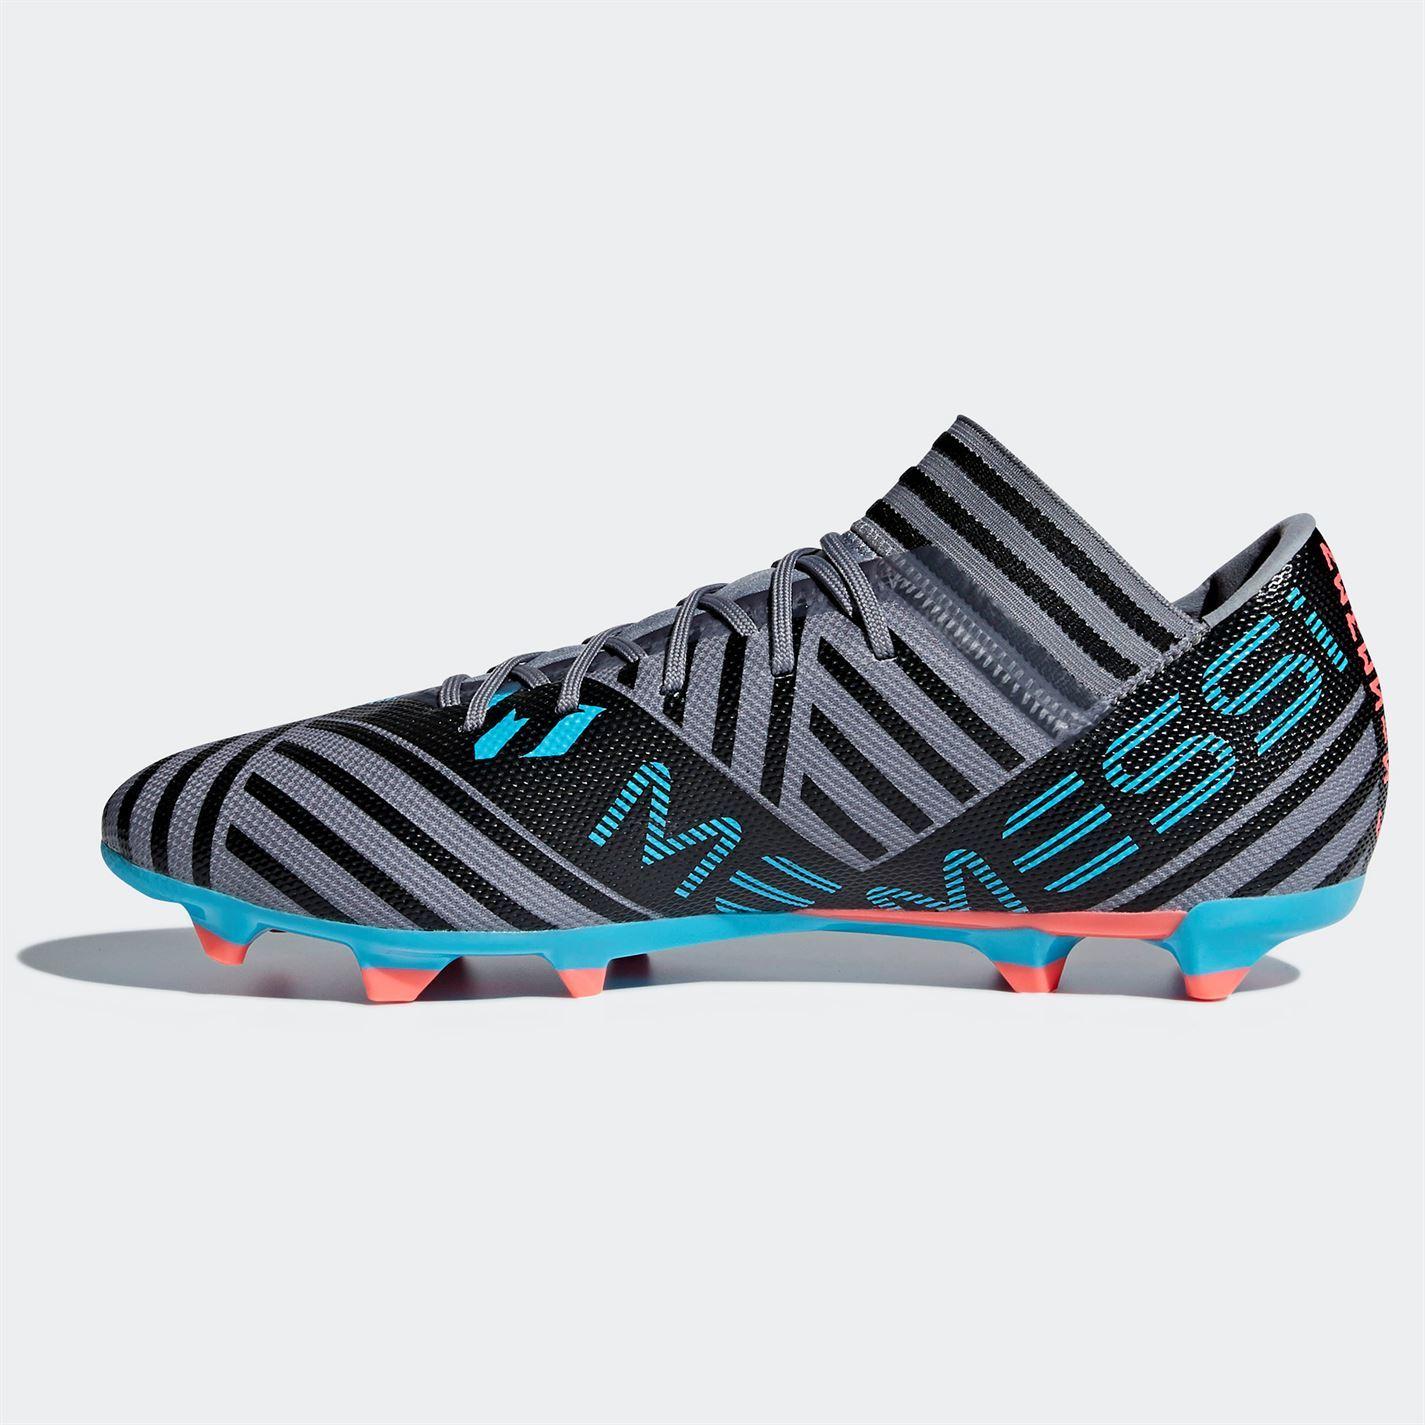 af58a9457c8618 ... adidas Nemeziz Messi 17.3 Firm Ground Football Boots Mens Grey Soccer  Cleats